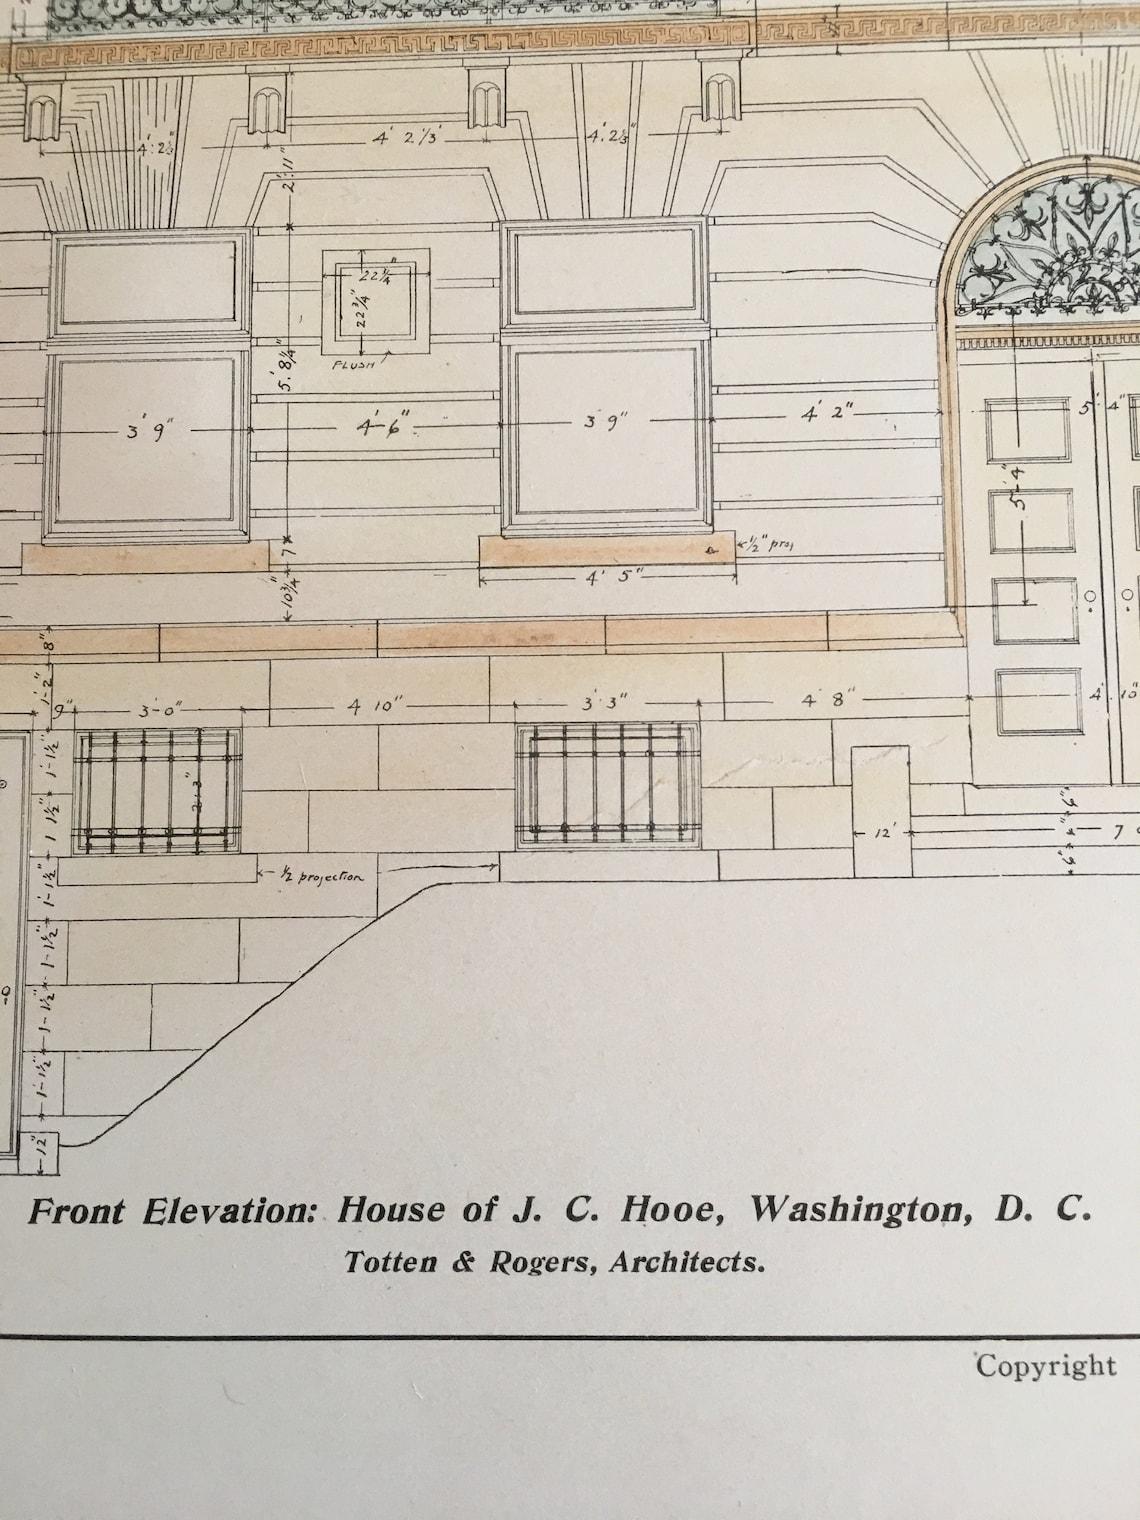 House of J. C. Hooe, Esq., Washington, DC, 1904